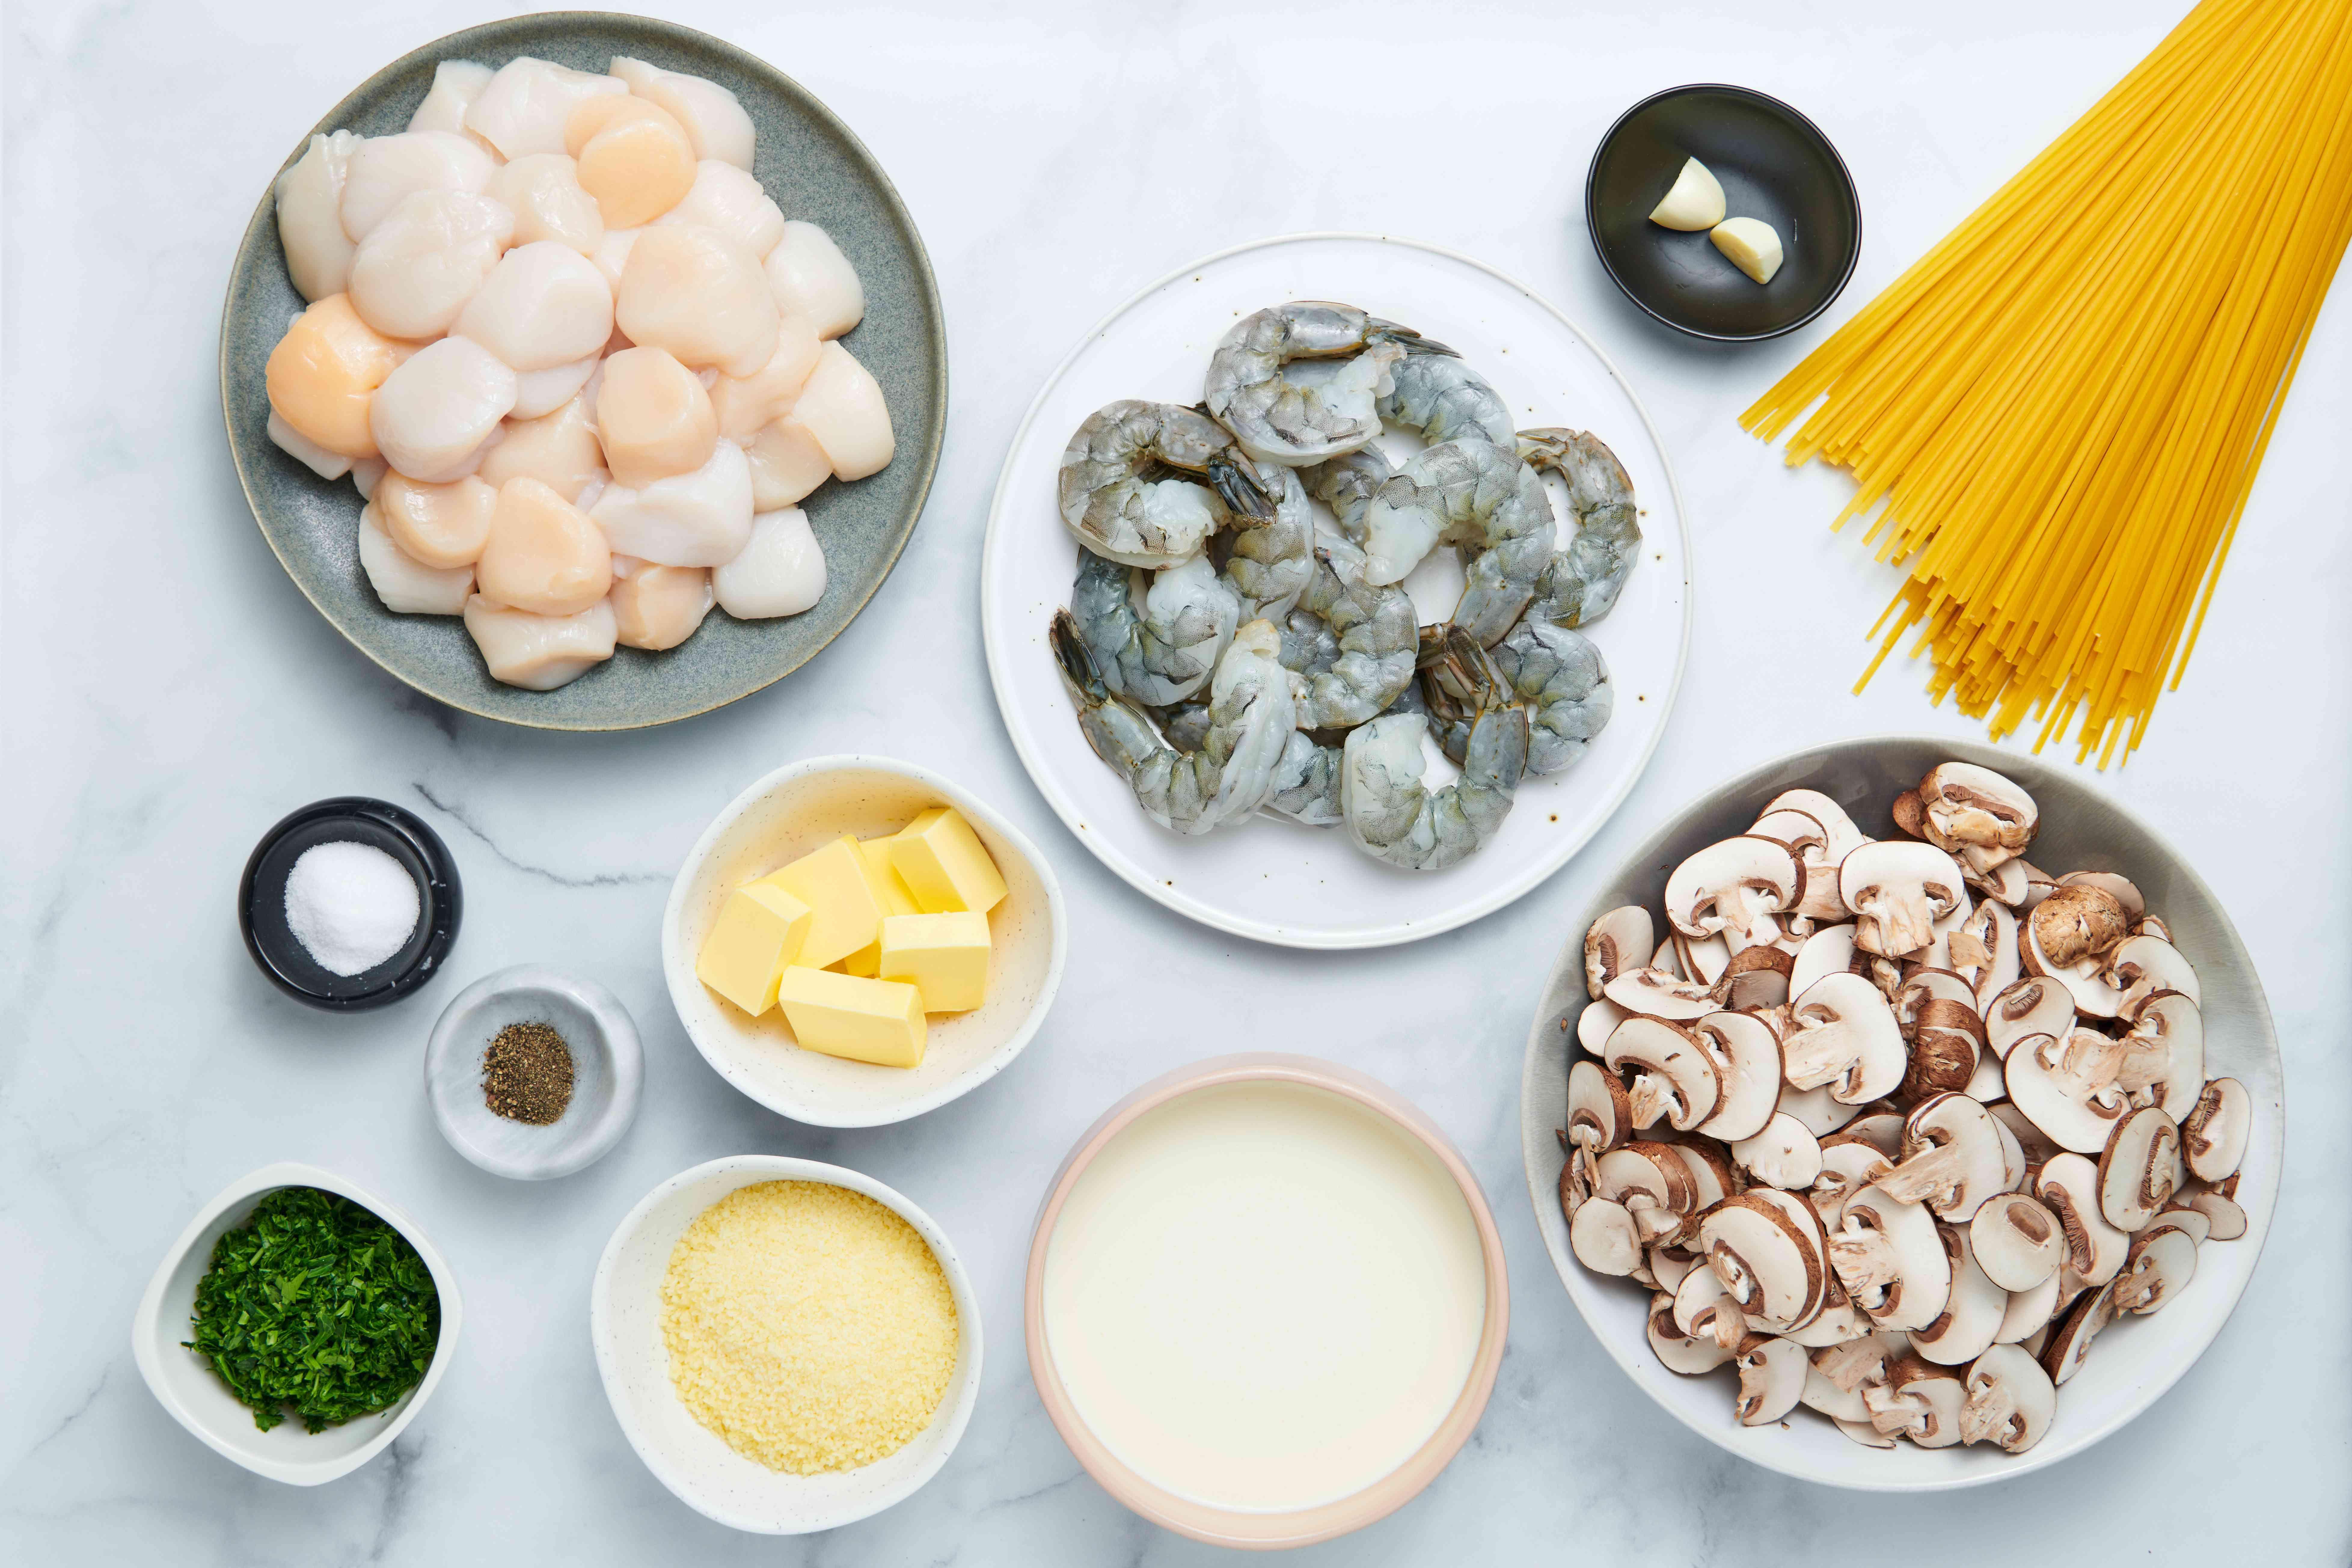 Seafood Pasta With Mushroom Cream Sauce ingredients